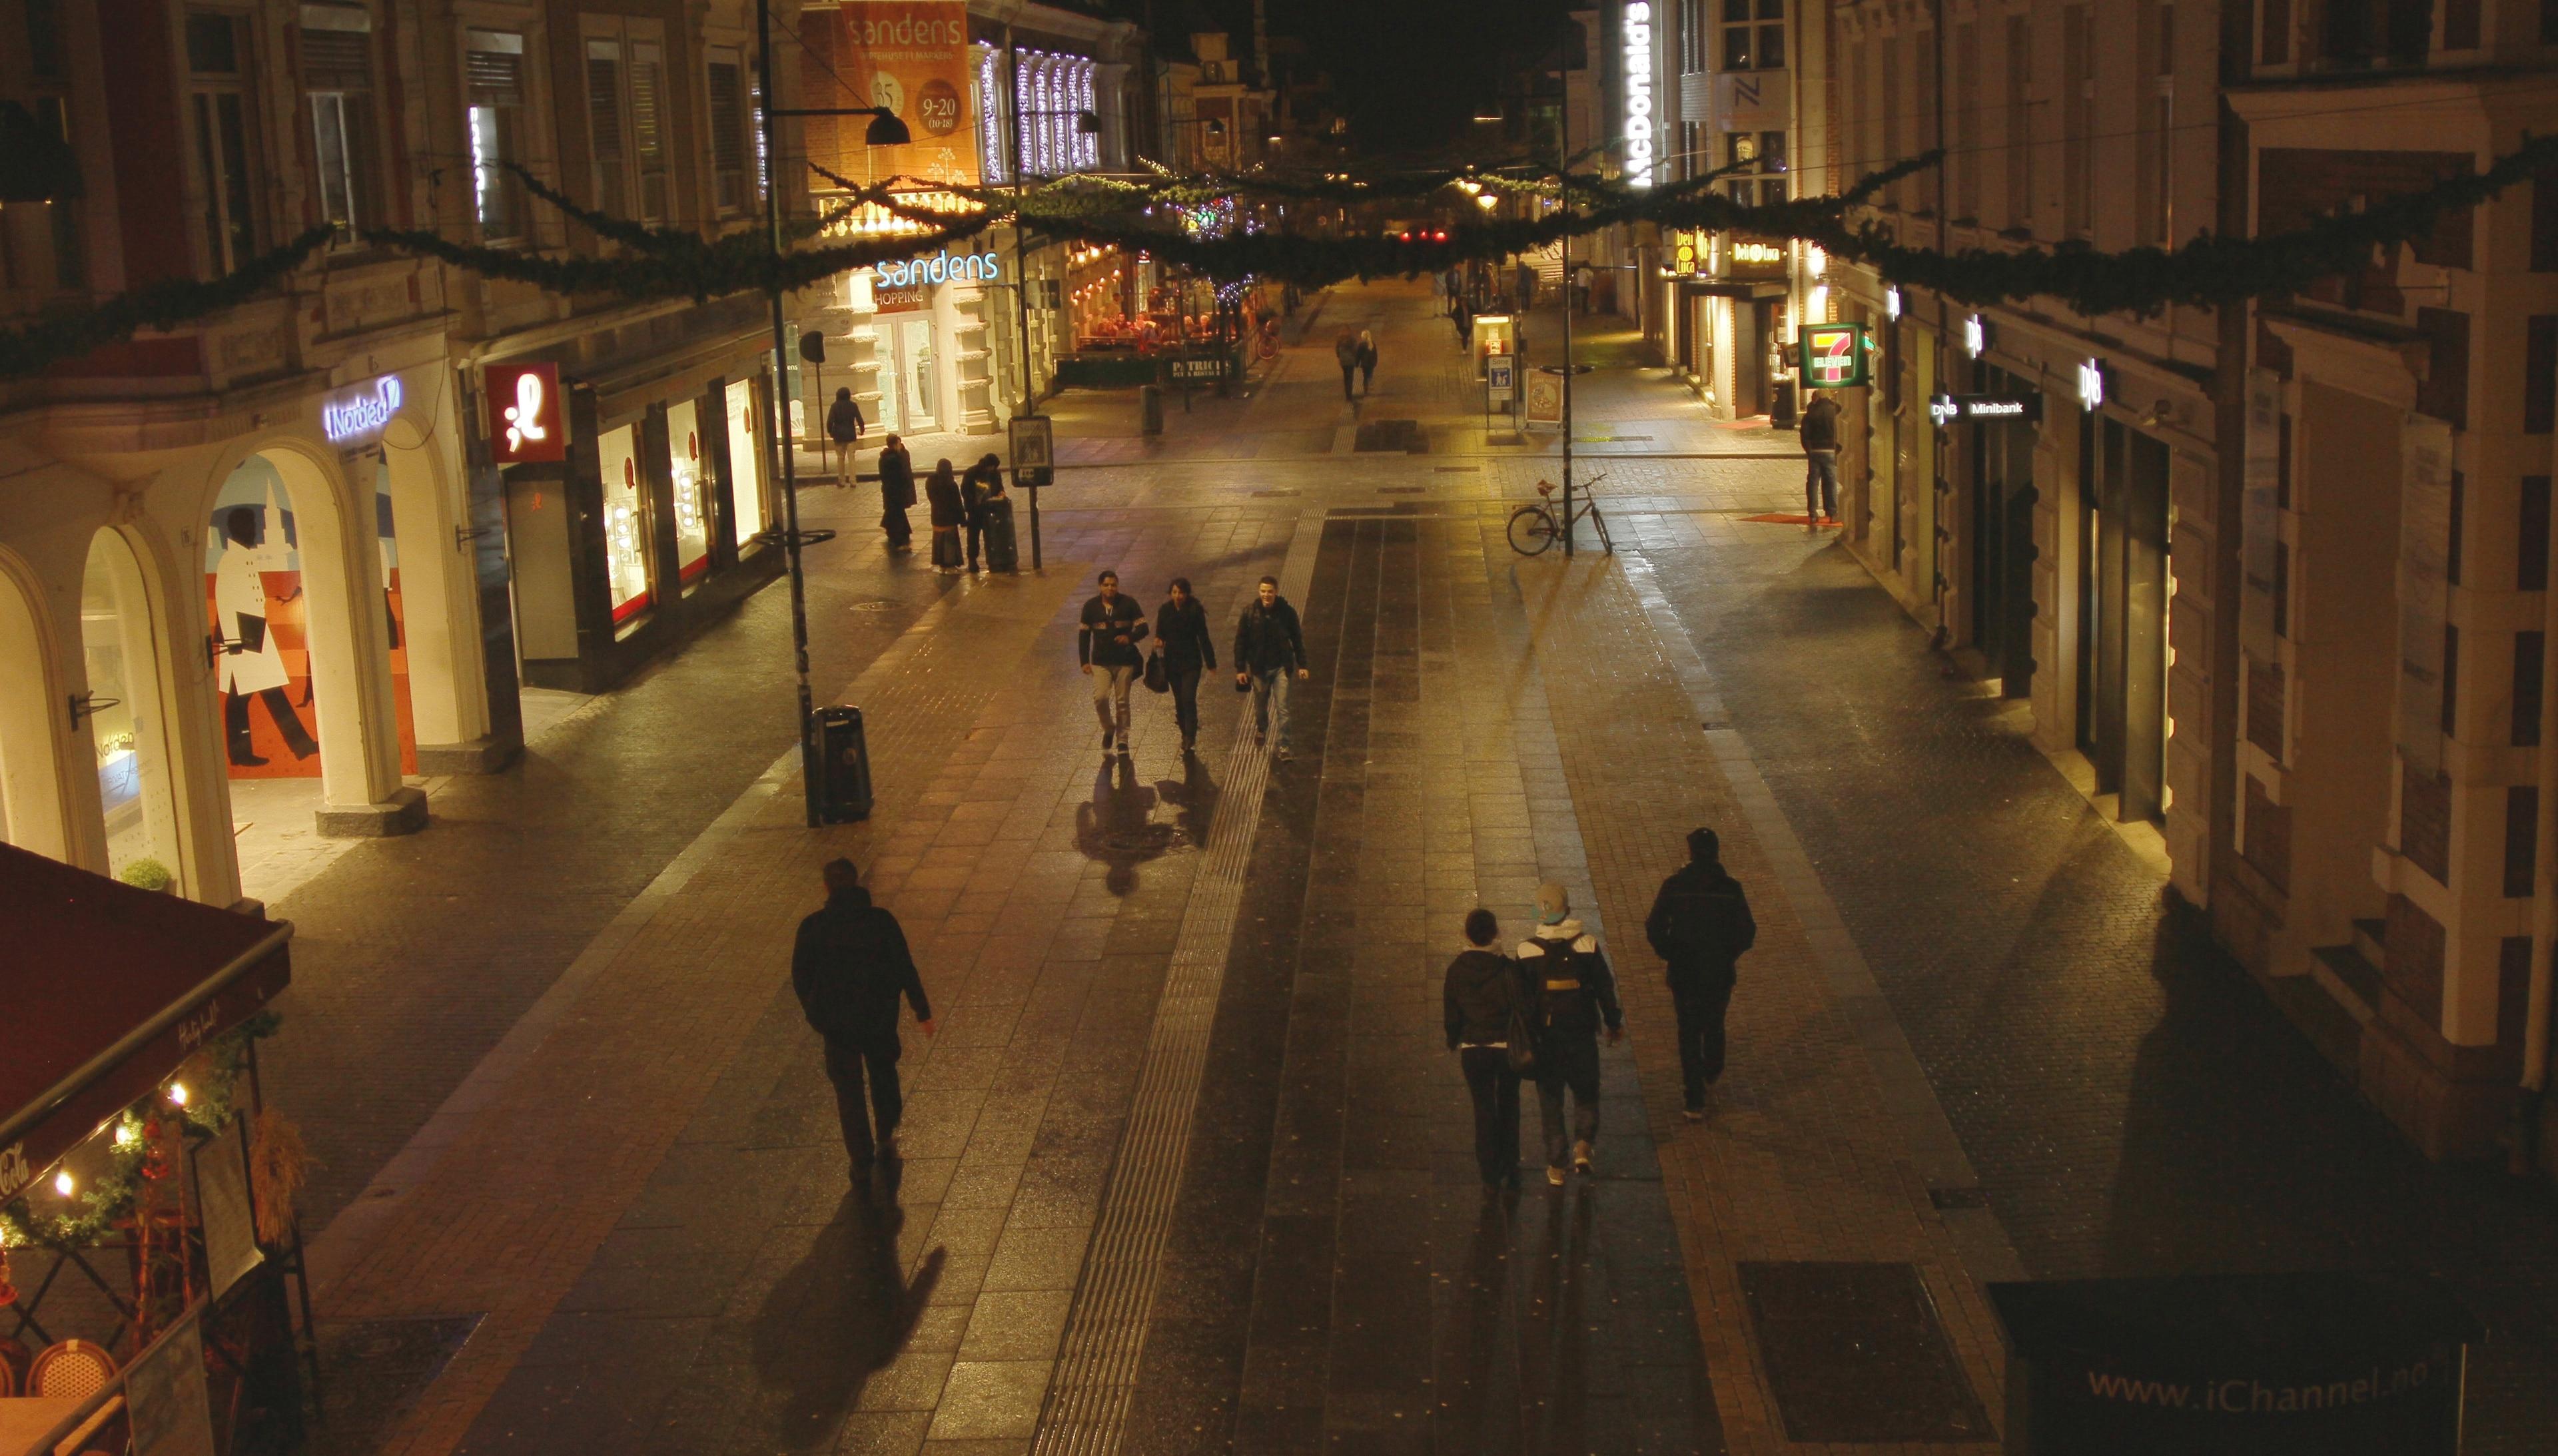 Kristiansand, Agder, Norway